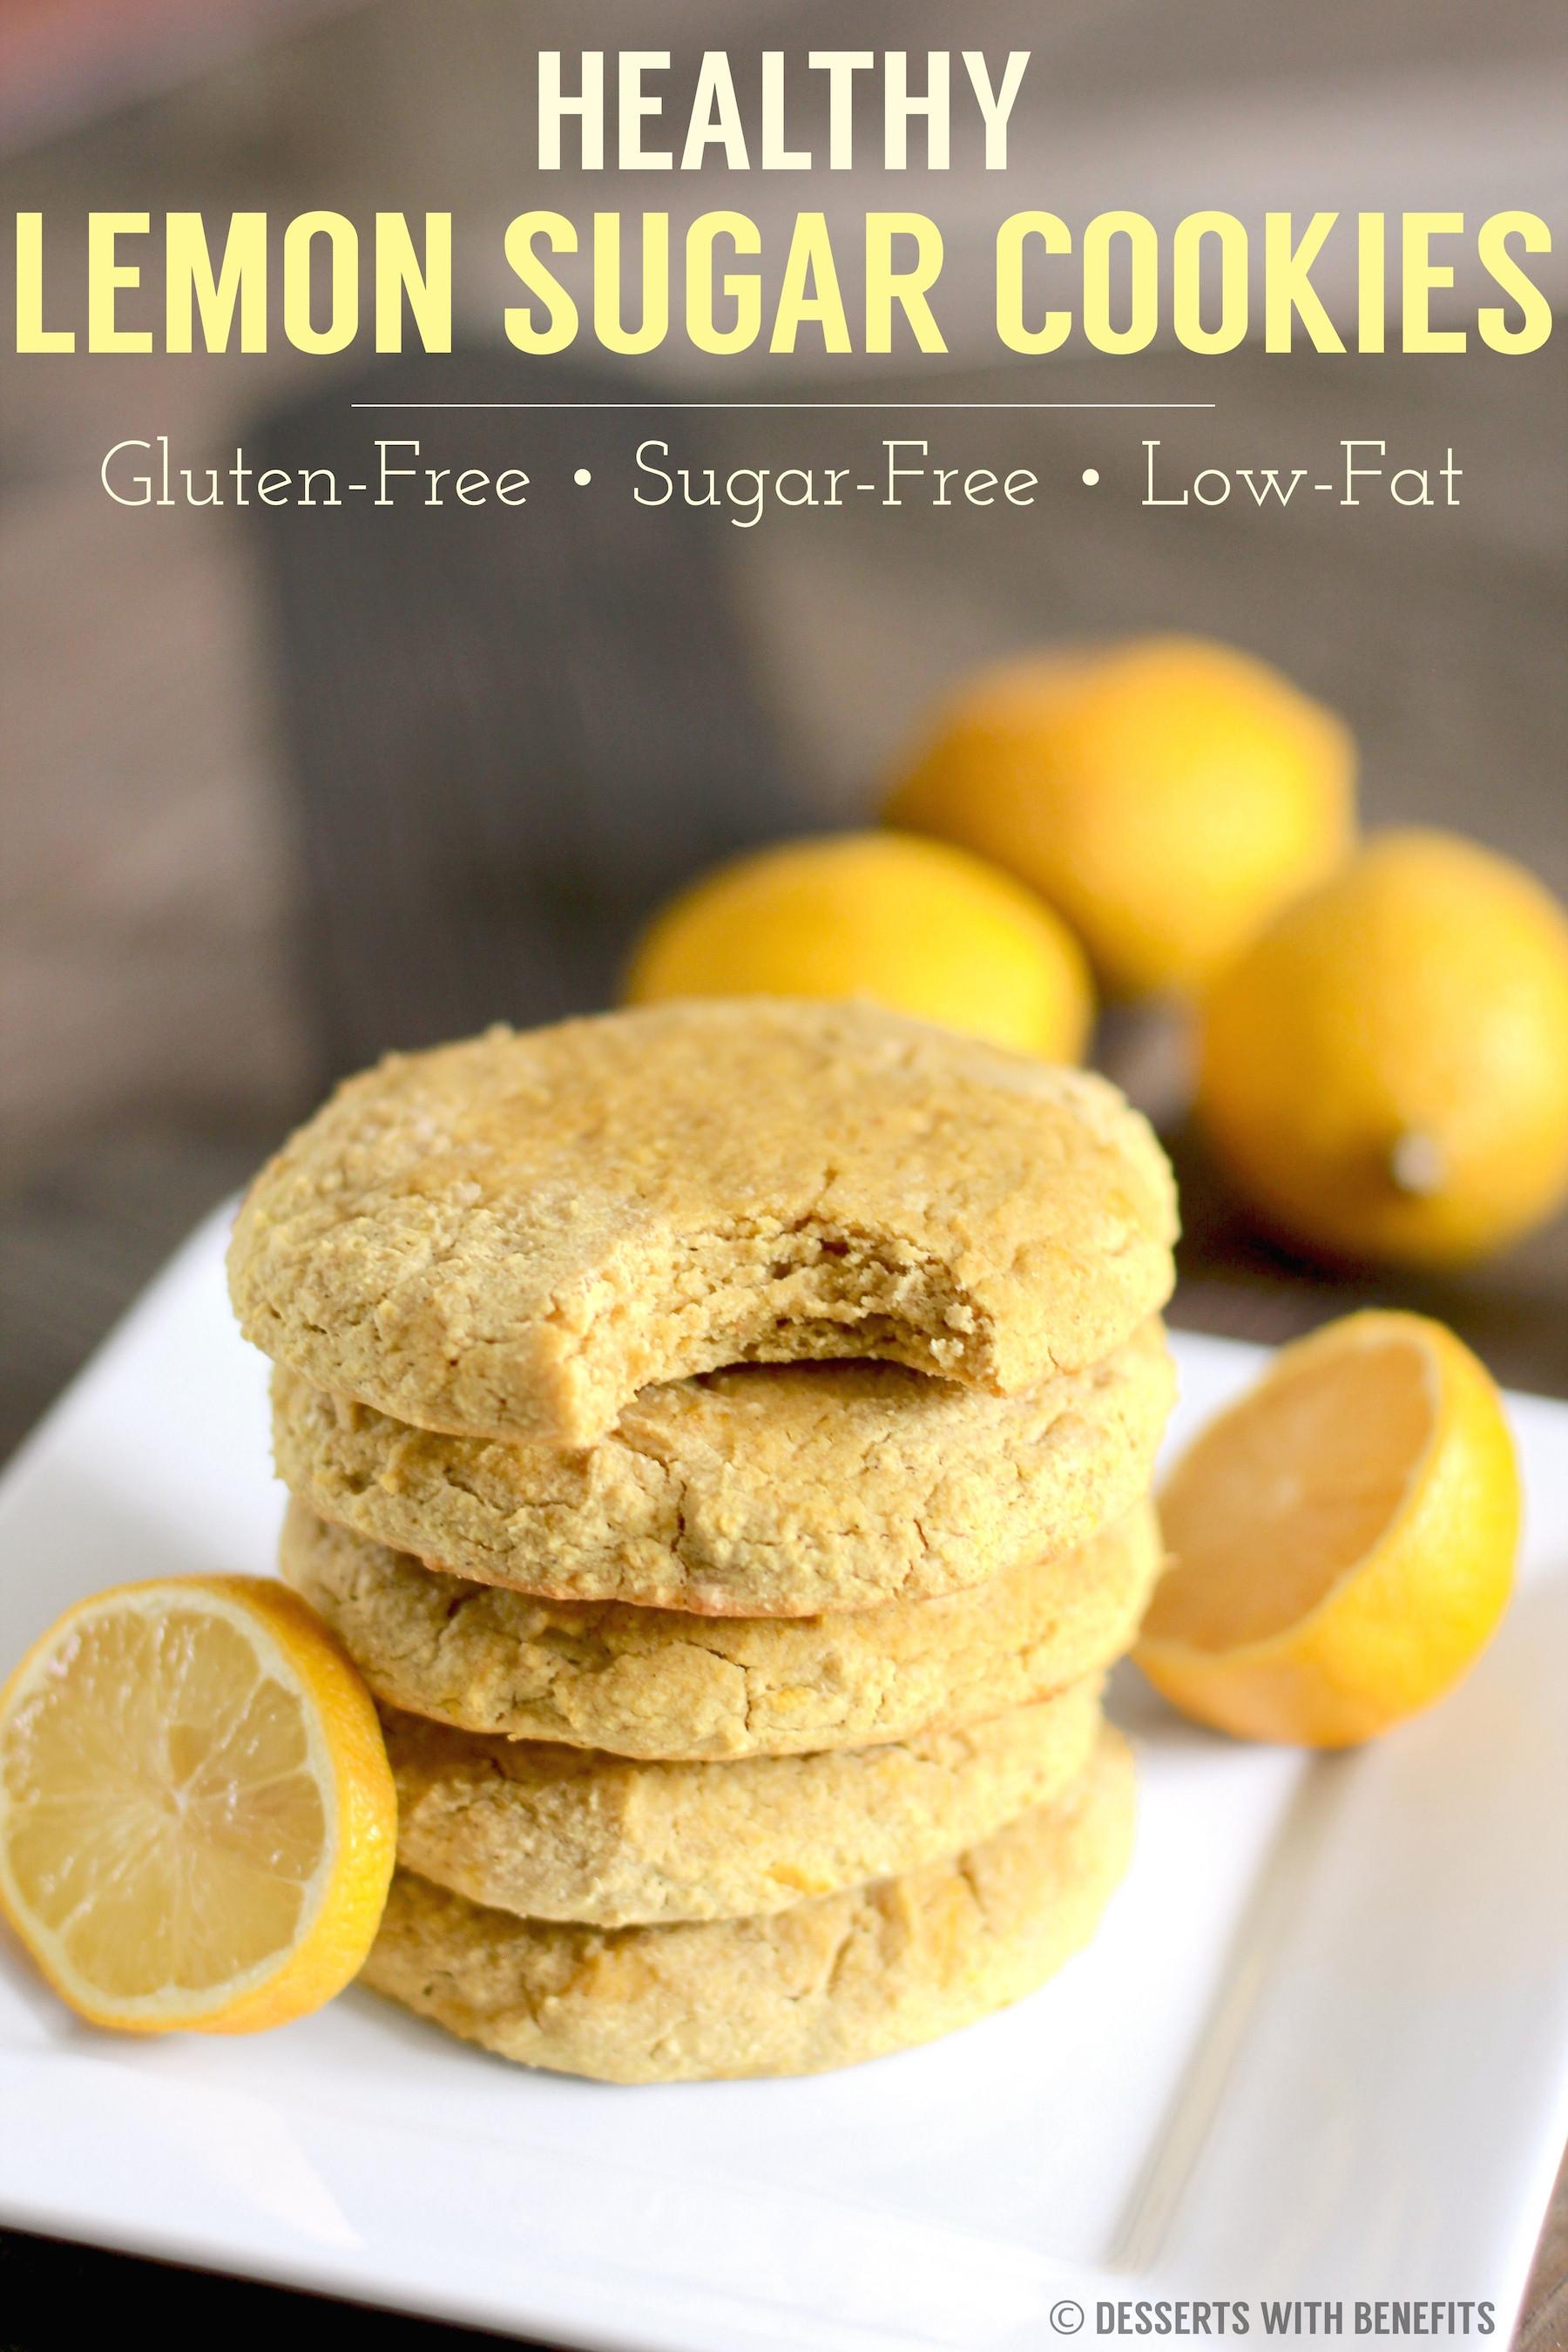 Healthy Gluten Free Cookie Recipes  Healthy Gluten Free Lemon Sugar Cookies Recipe